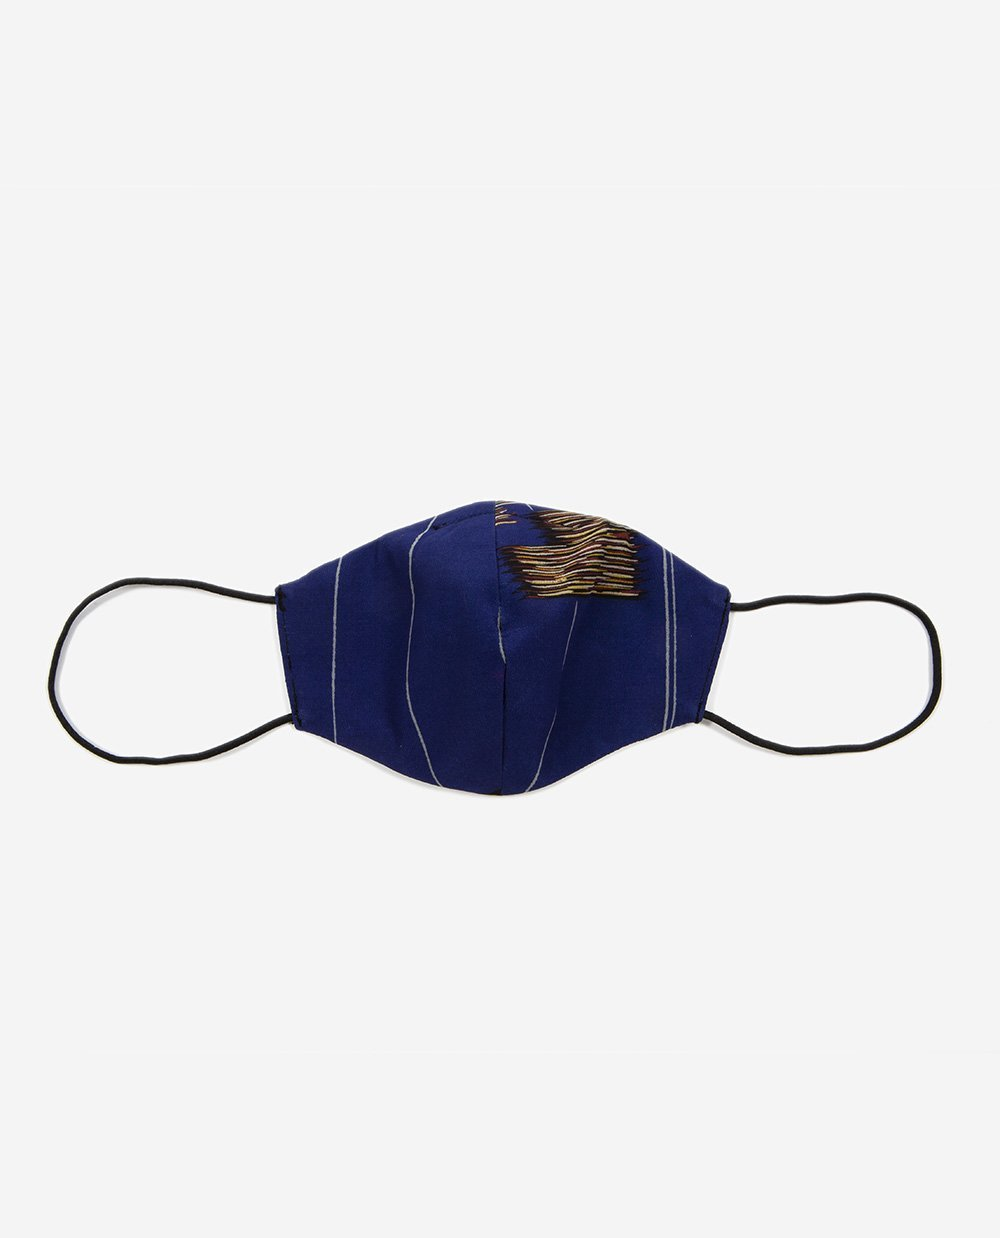 Mascarilla de tela reutilizable-delantera-VIRGINIA- Petty Things